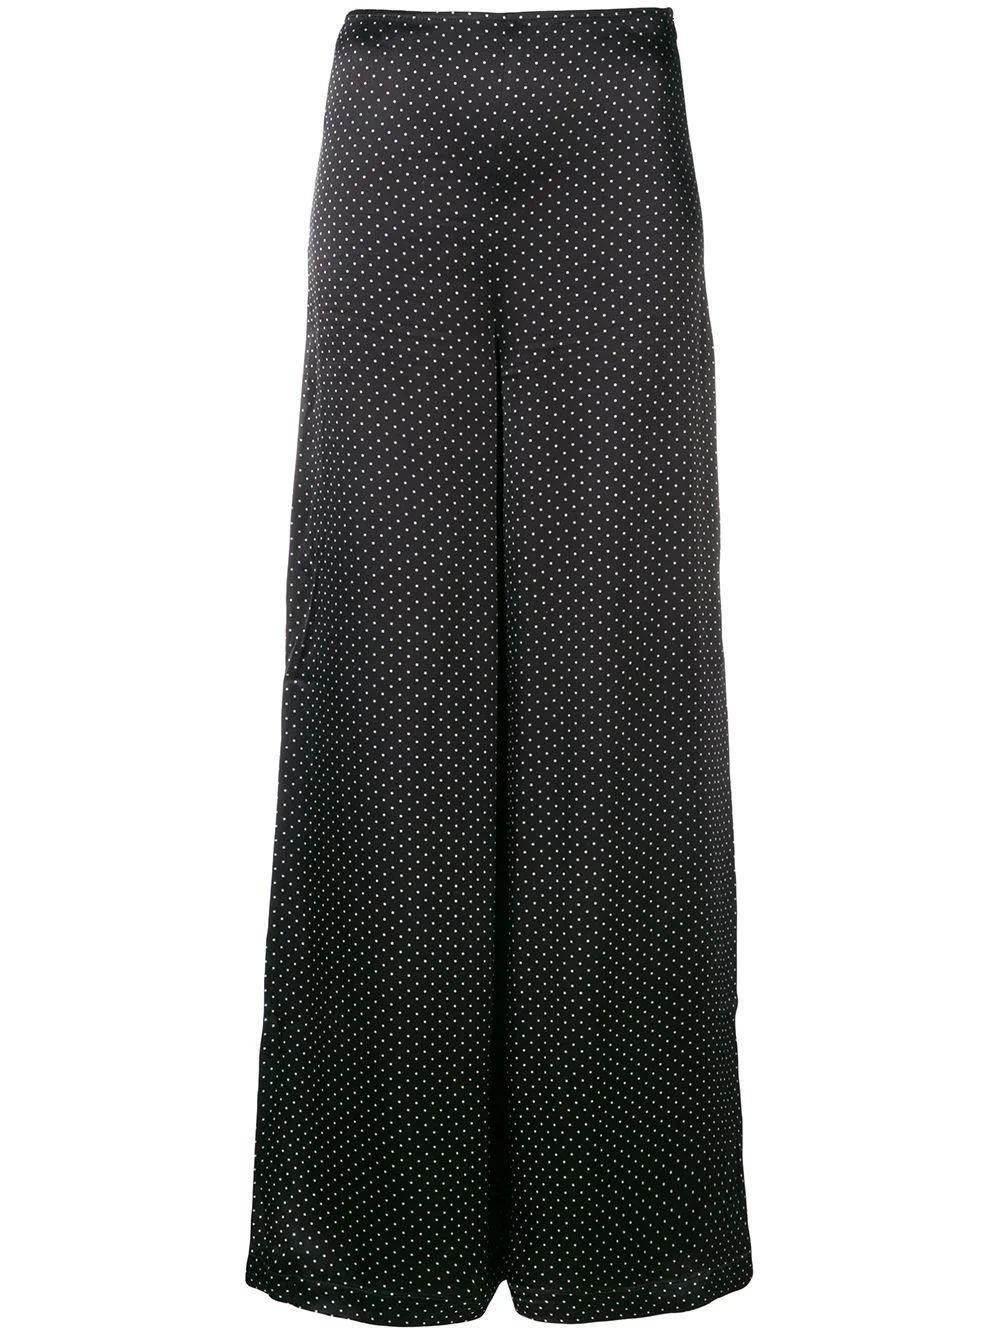 Cameron Dot Print Wide Leg Crop Pant